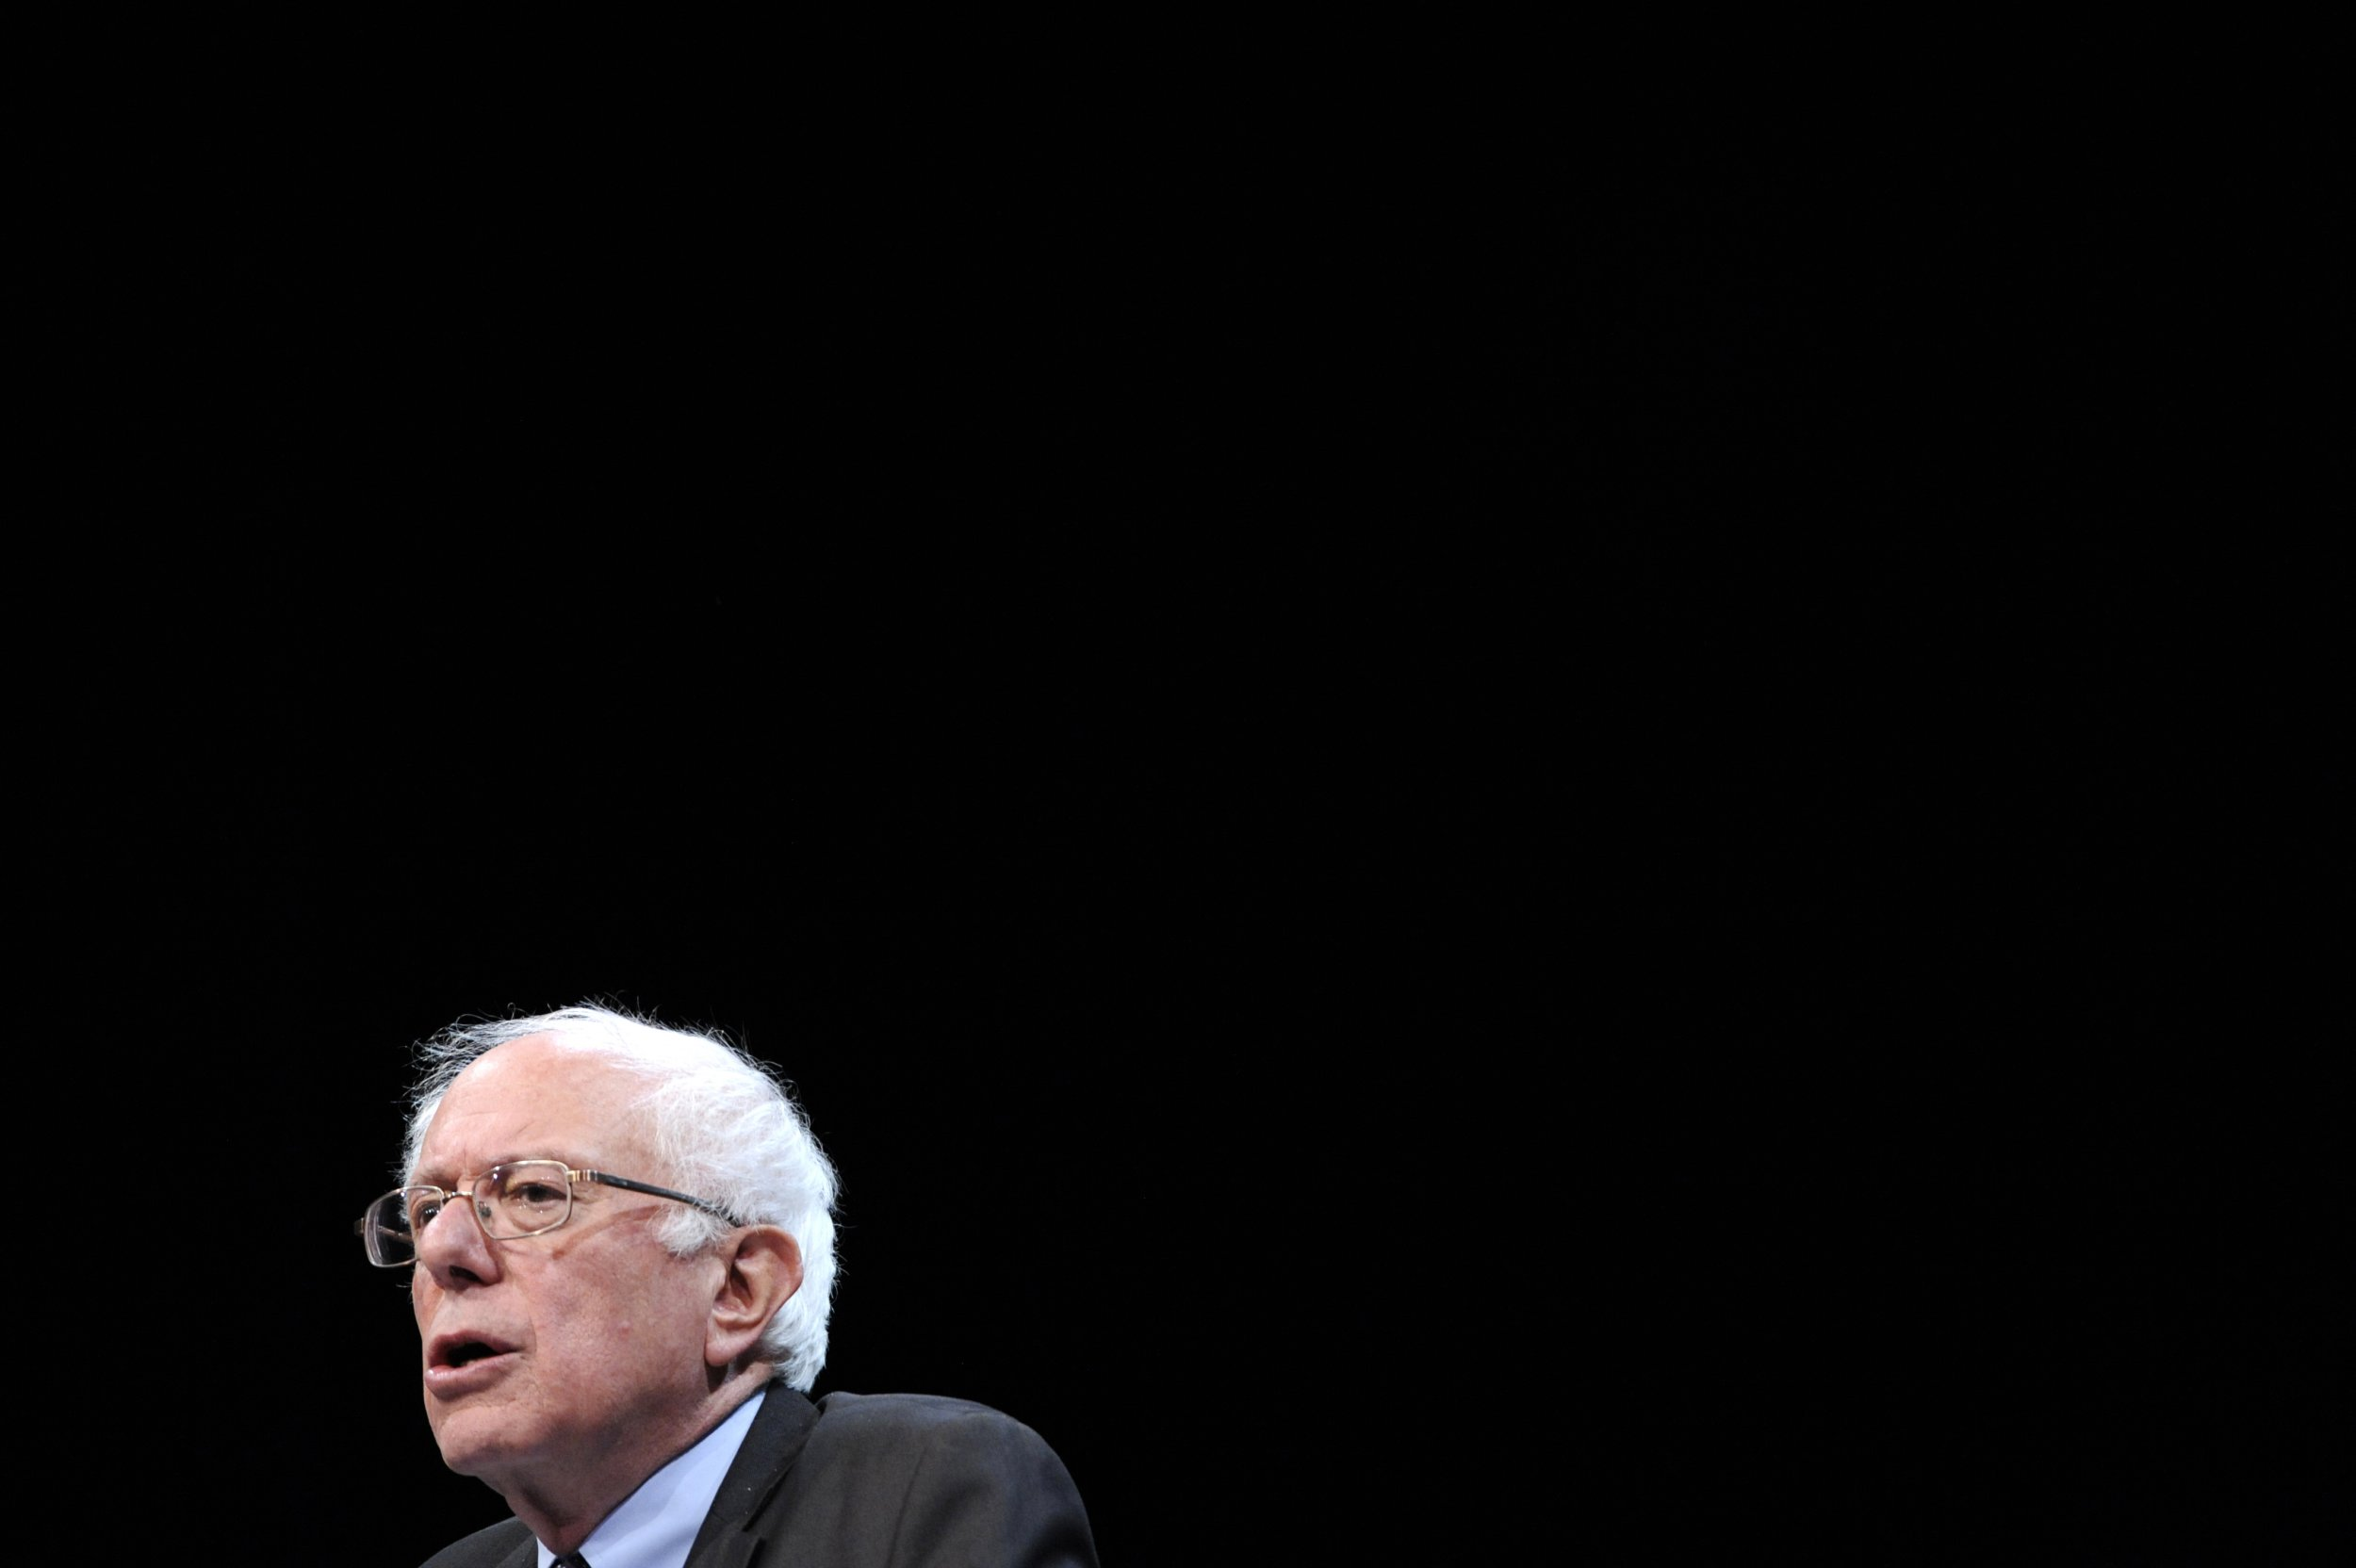 0330_Bernie_Sanders_Rachel_Maddow_interview_01